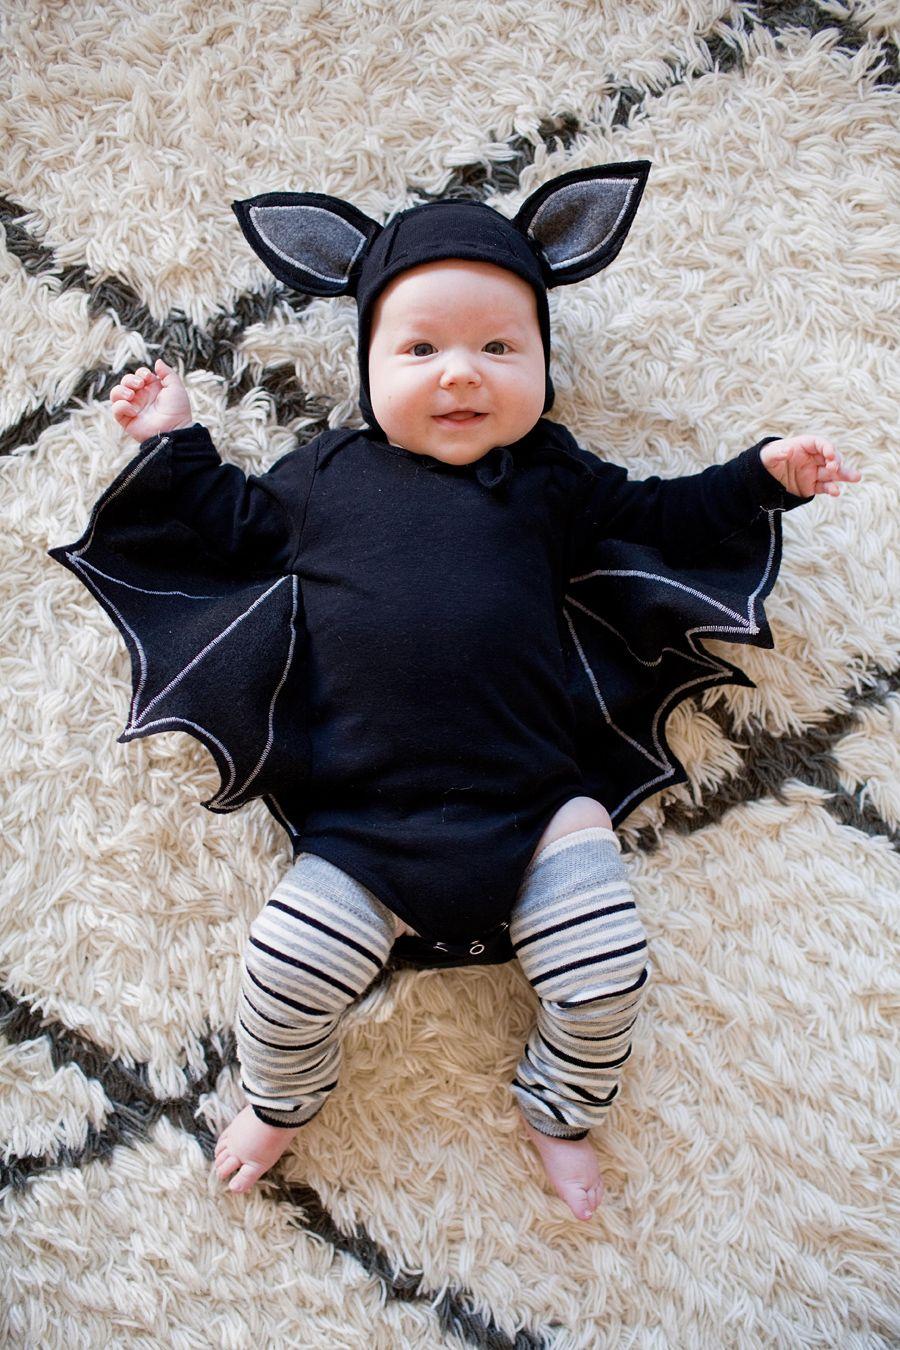 MONSTER FAMILY COSTUME DIY | Murciélagos bebé, Disfraz de murciélago ...